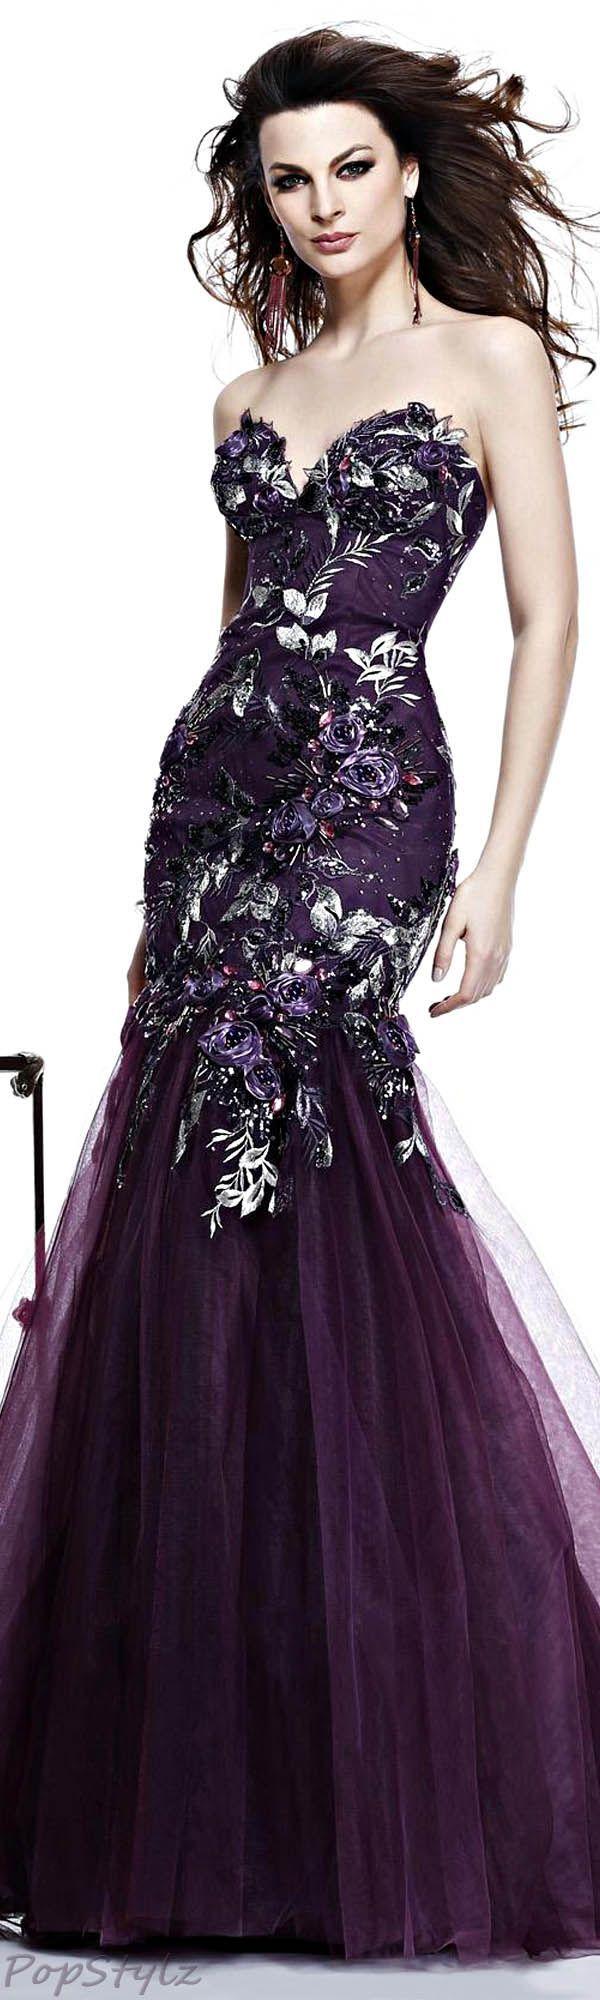 best for jayde images on pinterest bridal gowns short wedding